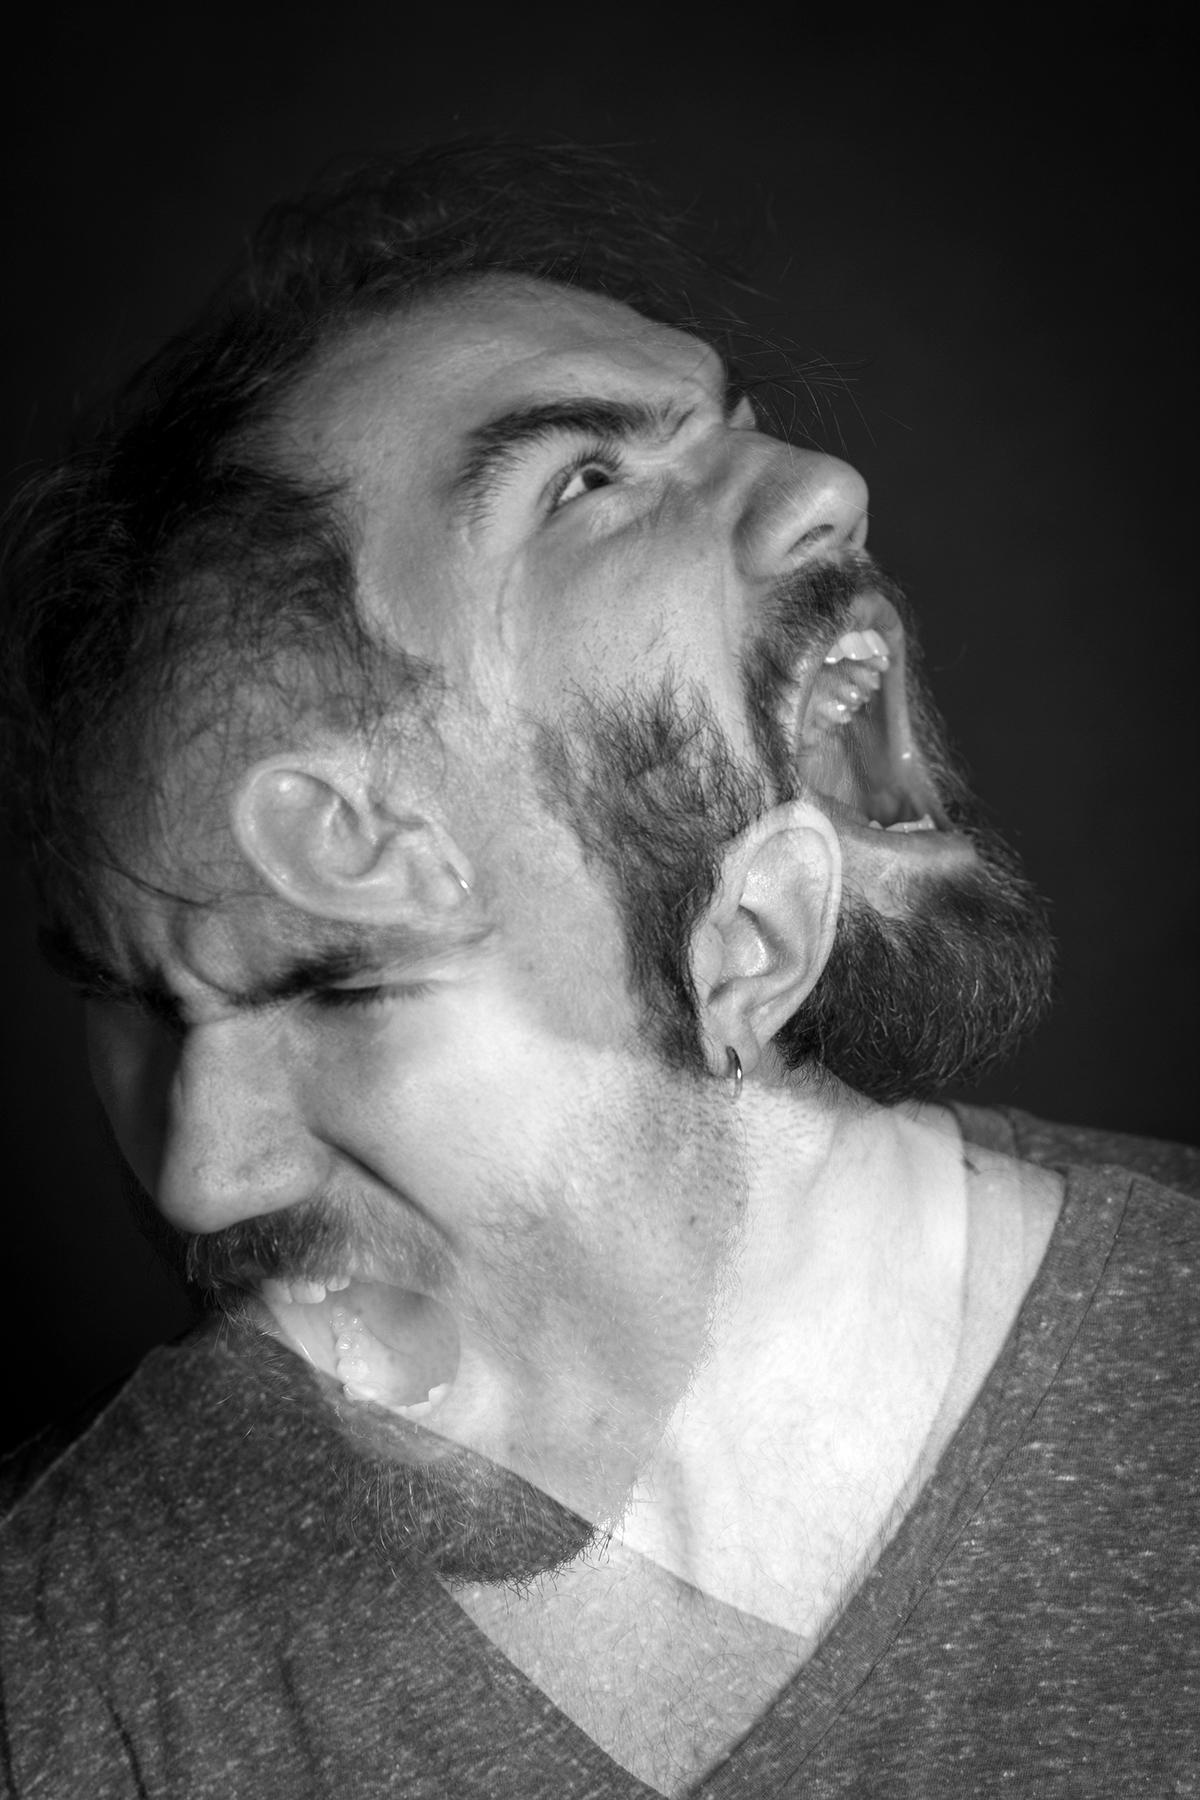 studio studio lighting student portraits portrait